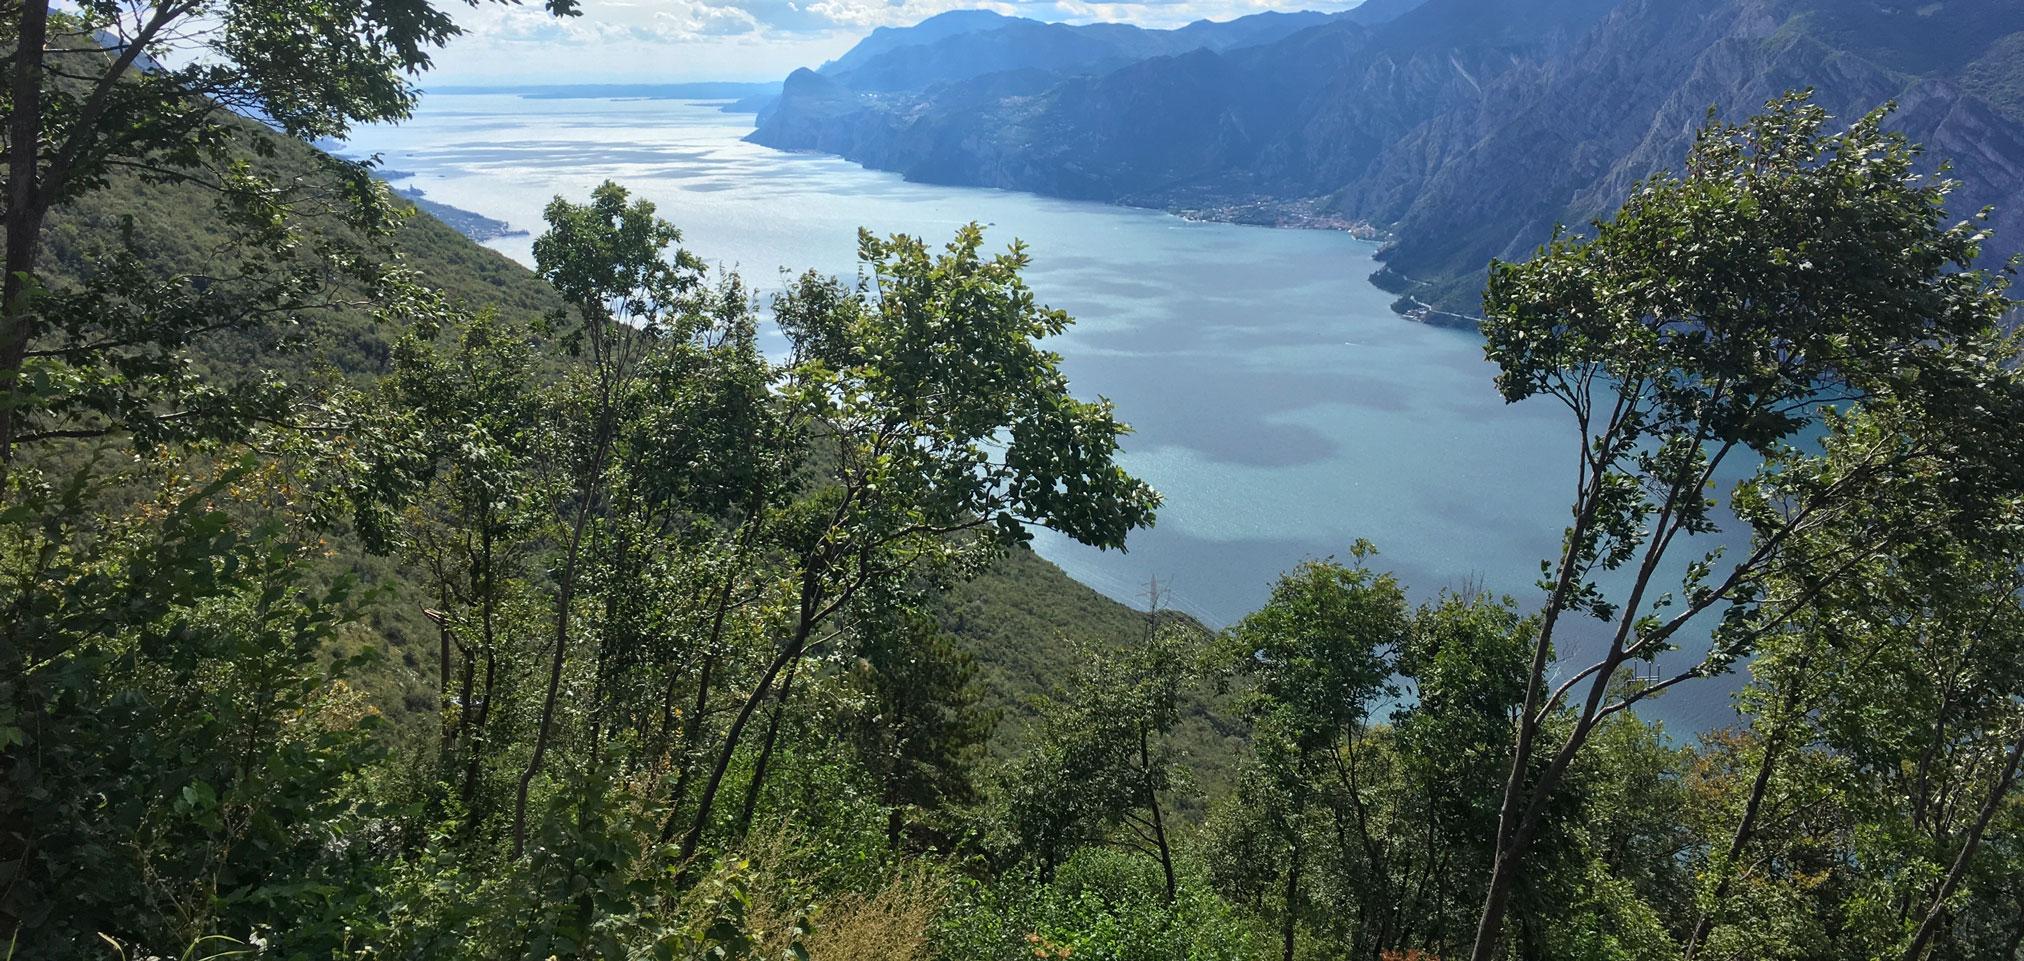 Herb walks on Monte Baldo, 19 may